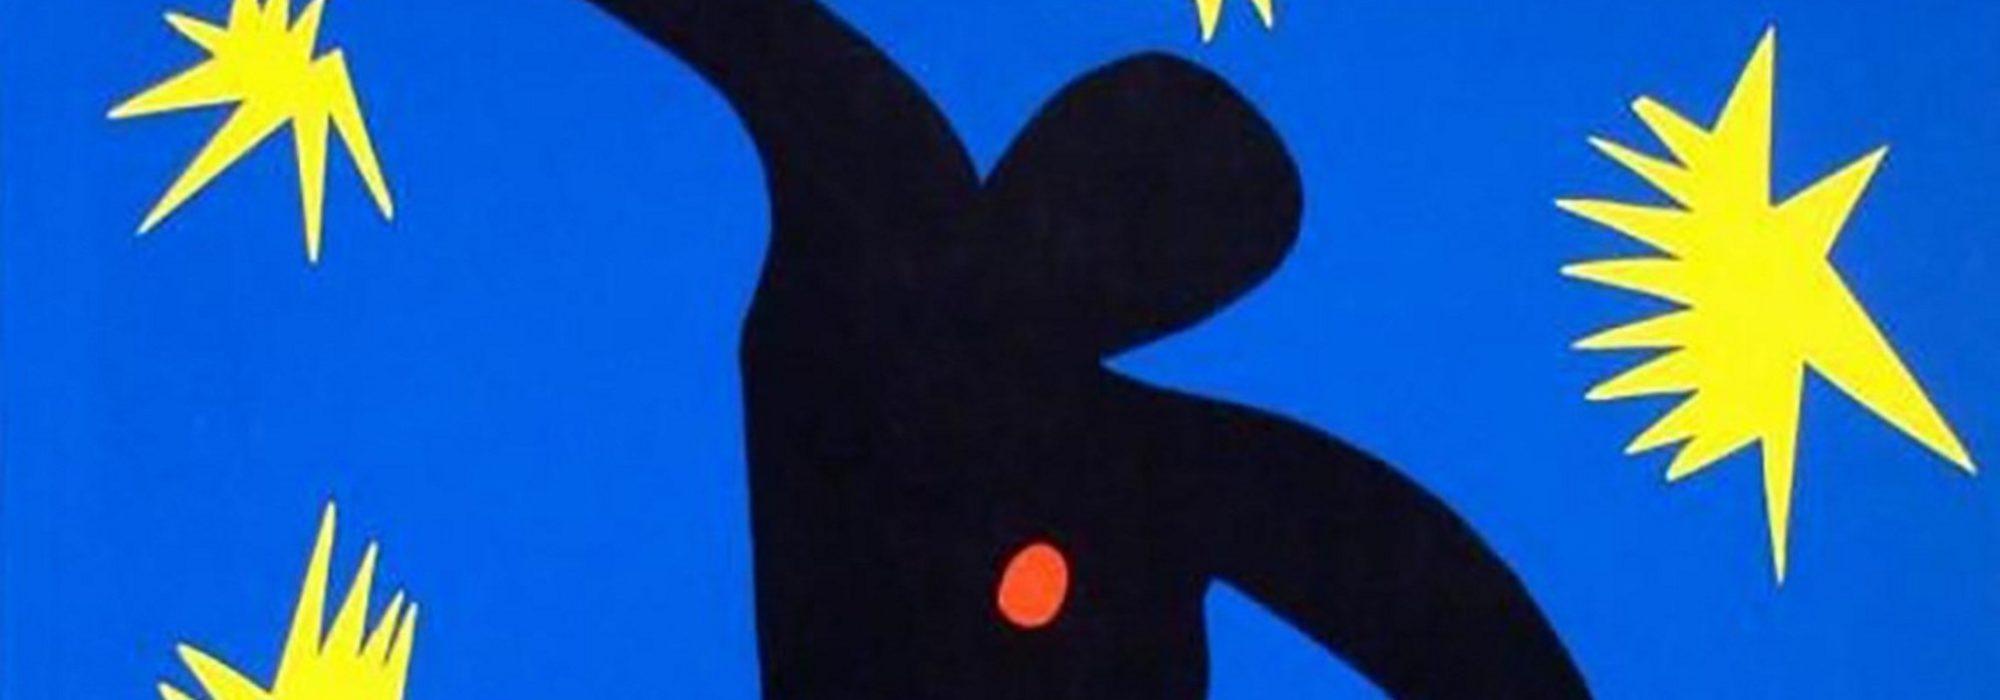 Imagem: Icarus from Jazz (Matisse, 1947, detalhe)